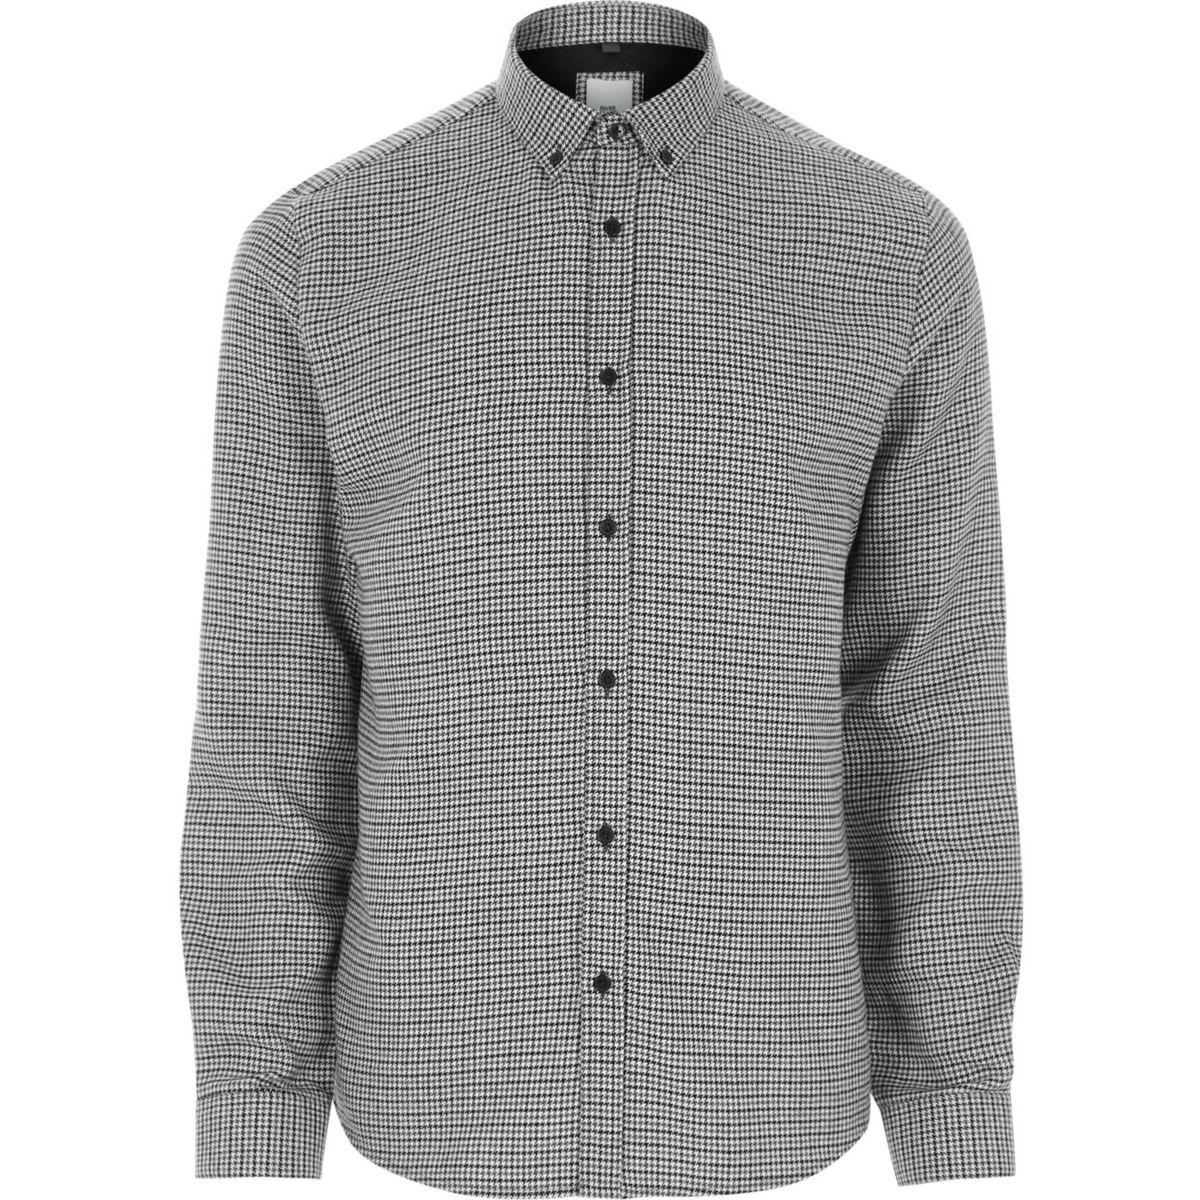 Black check slim fit button-down shirt